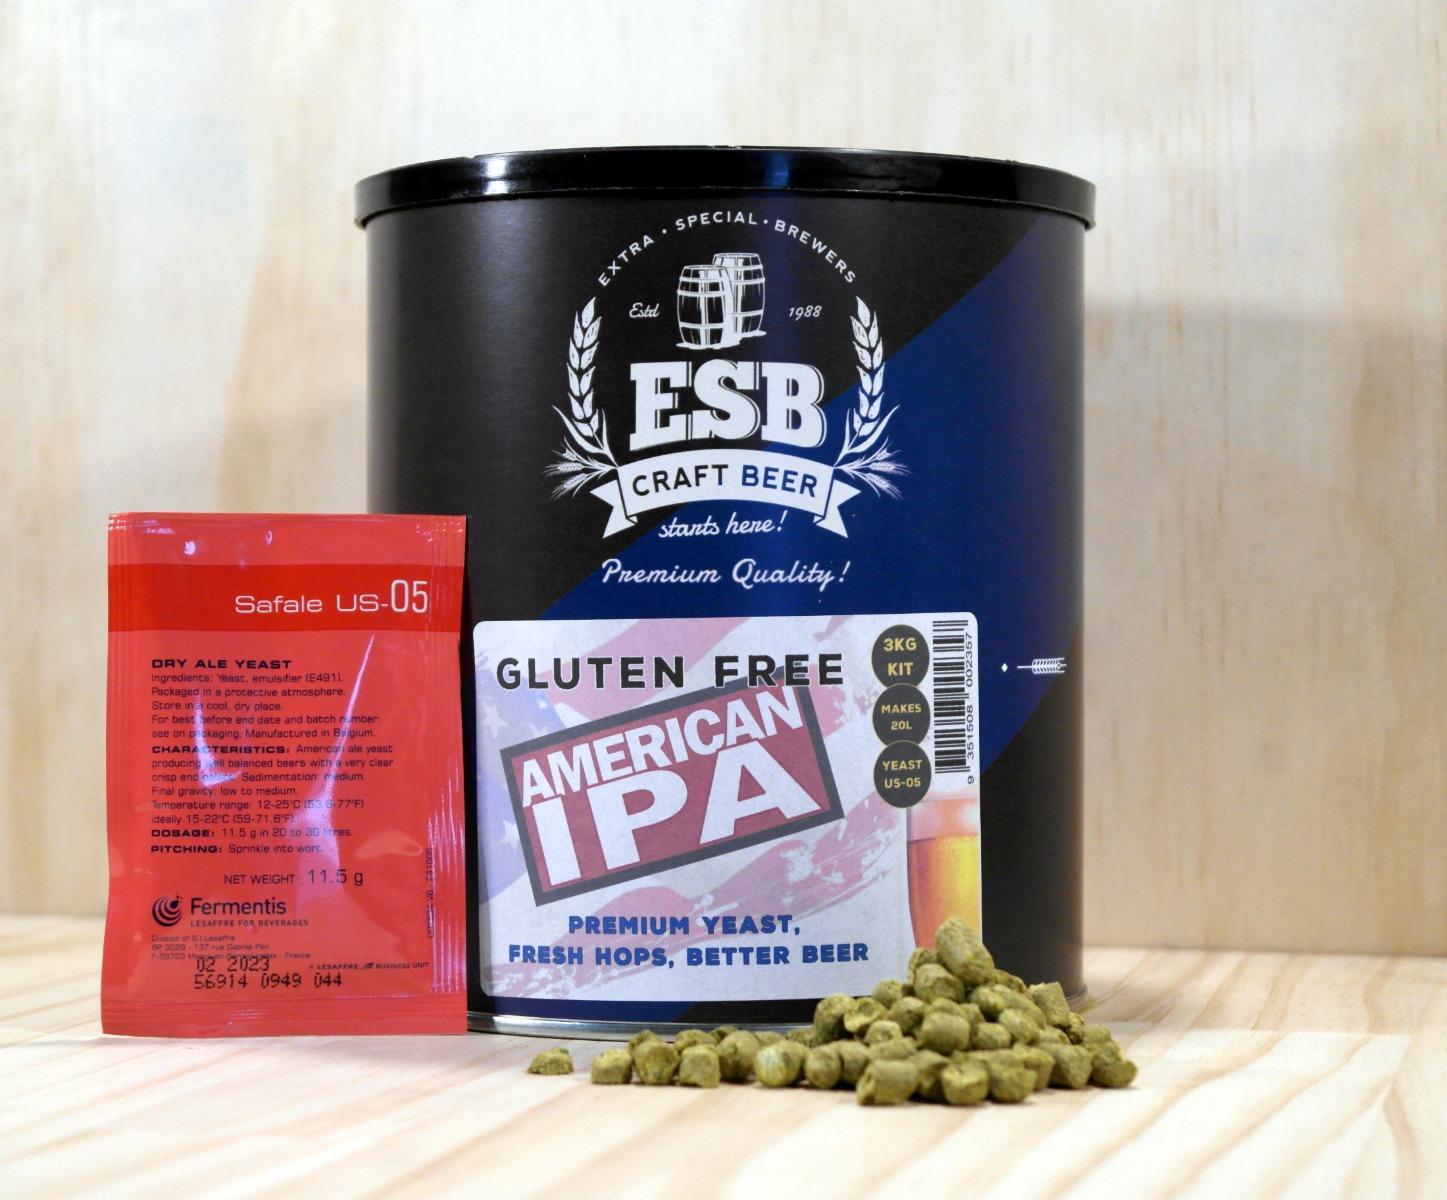 ESB 3kg Gluten Free American IPA